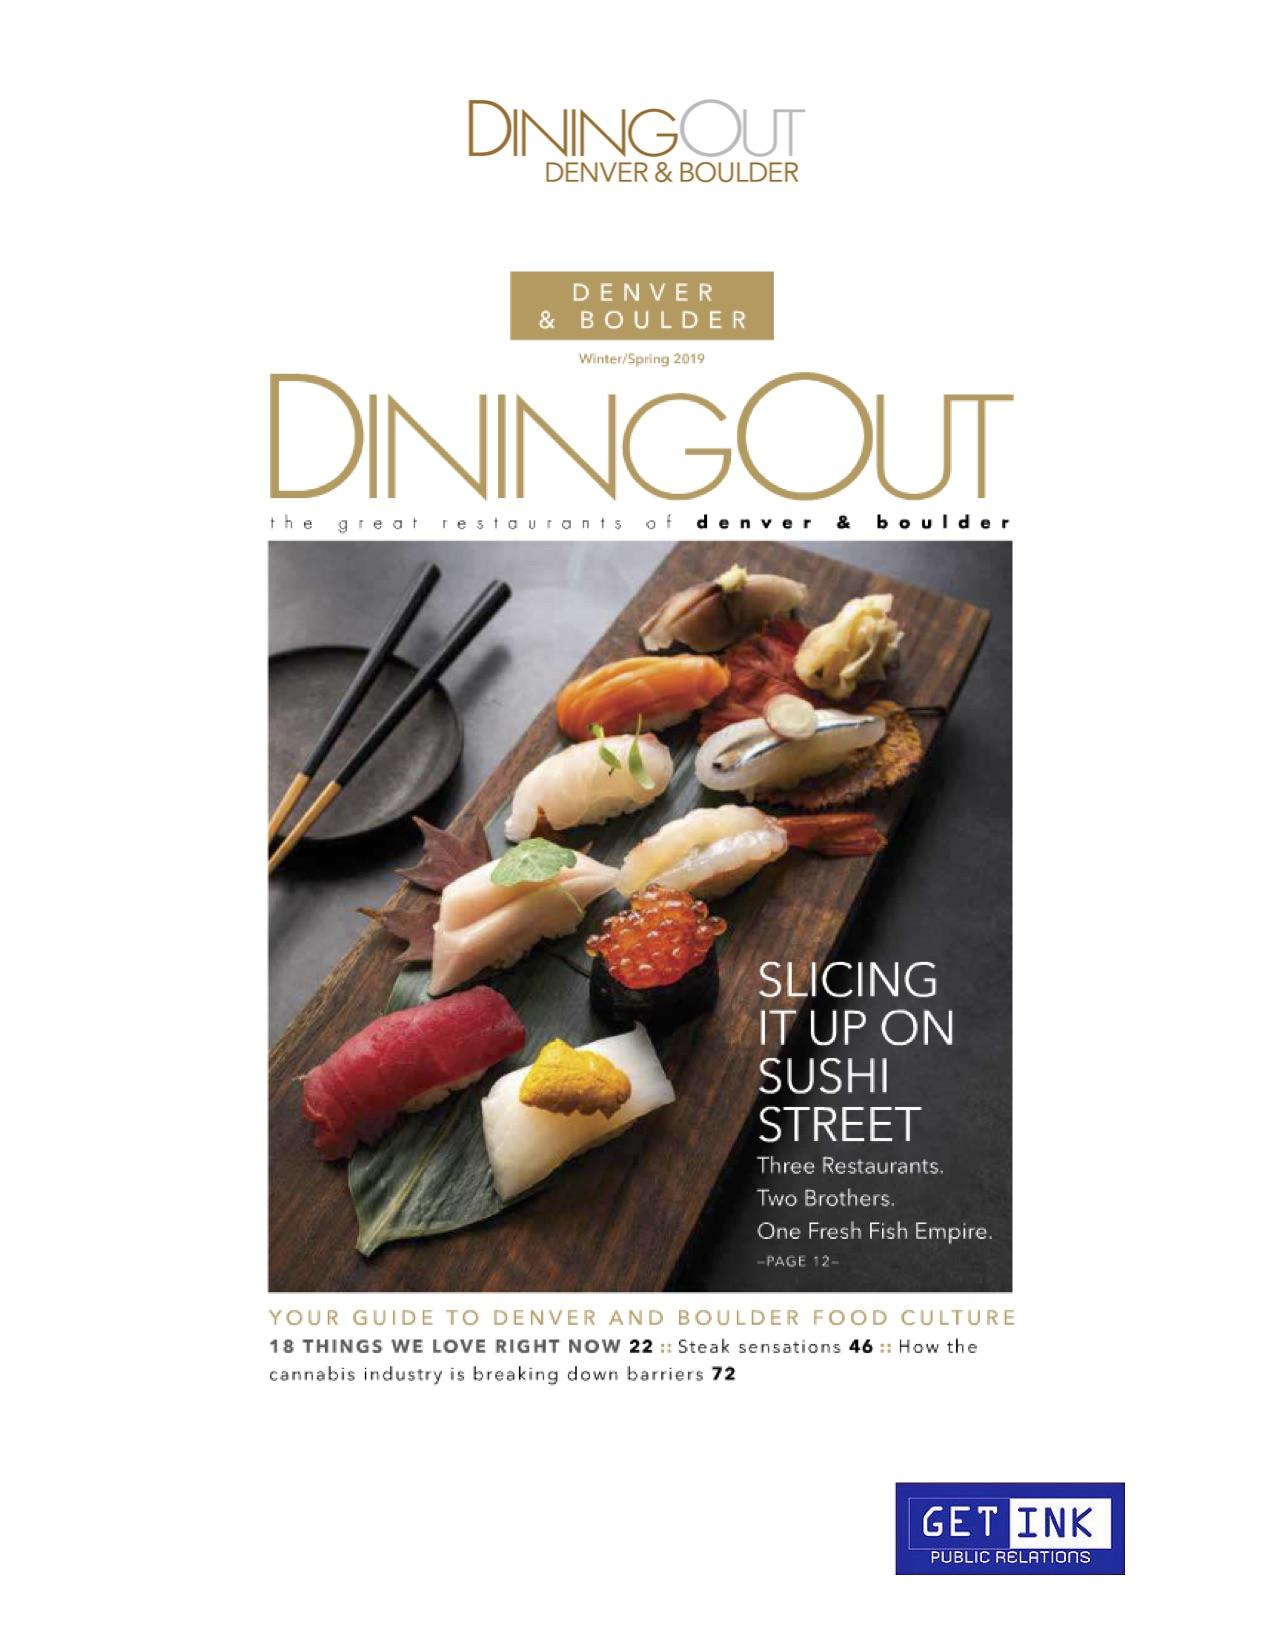 Sushi Den, Izakaya Den, Ototo Den Dining Out - Get Ink Pr